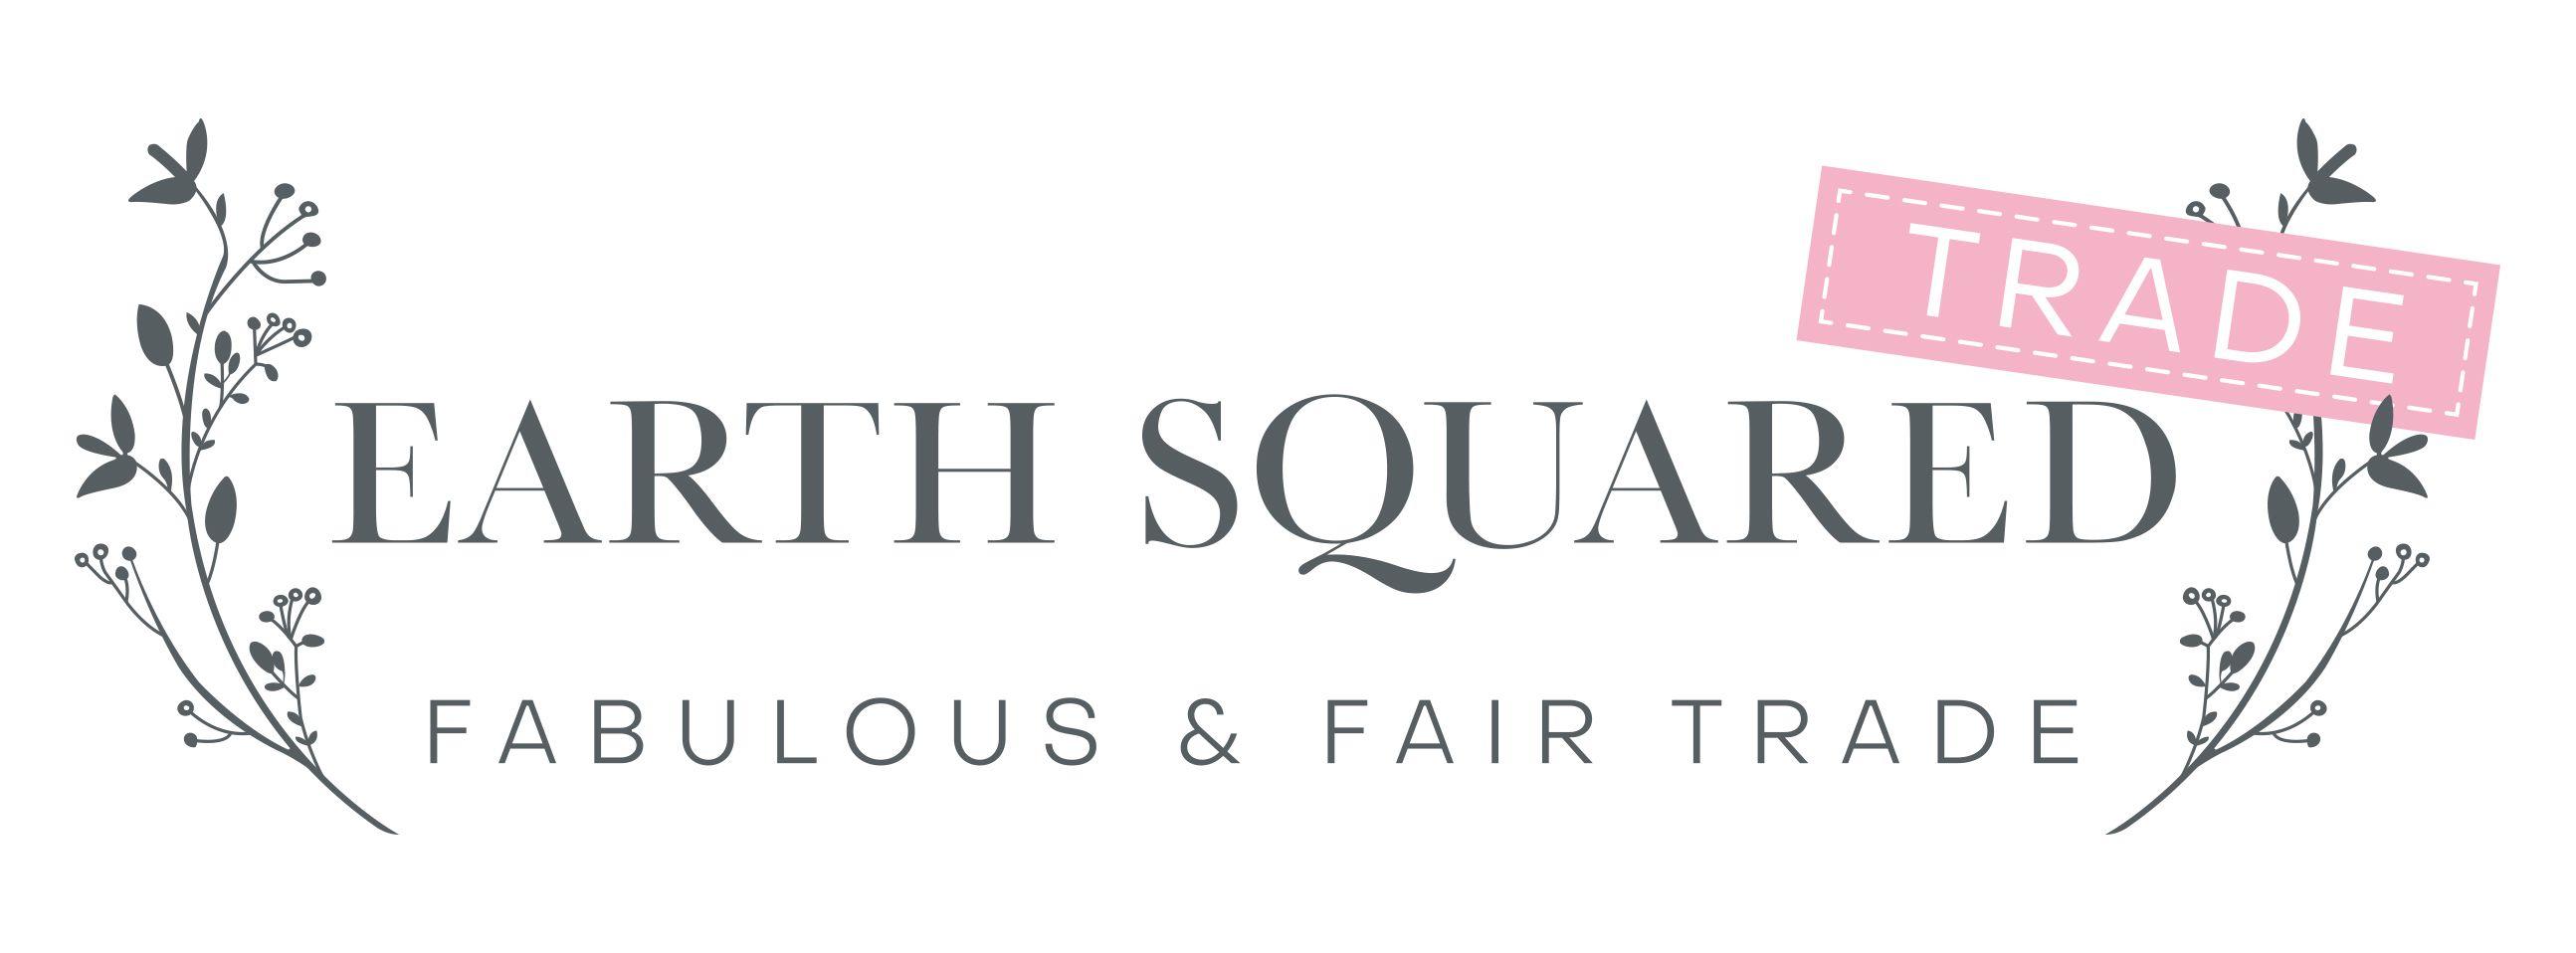 Earth Squared